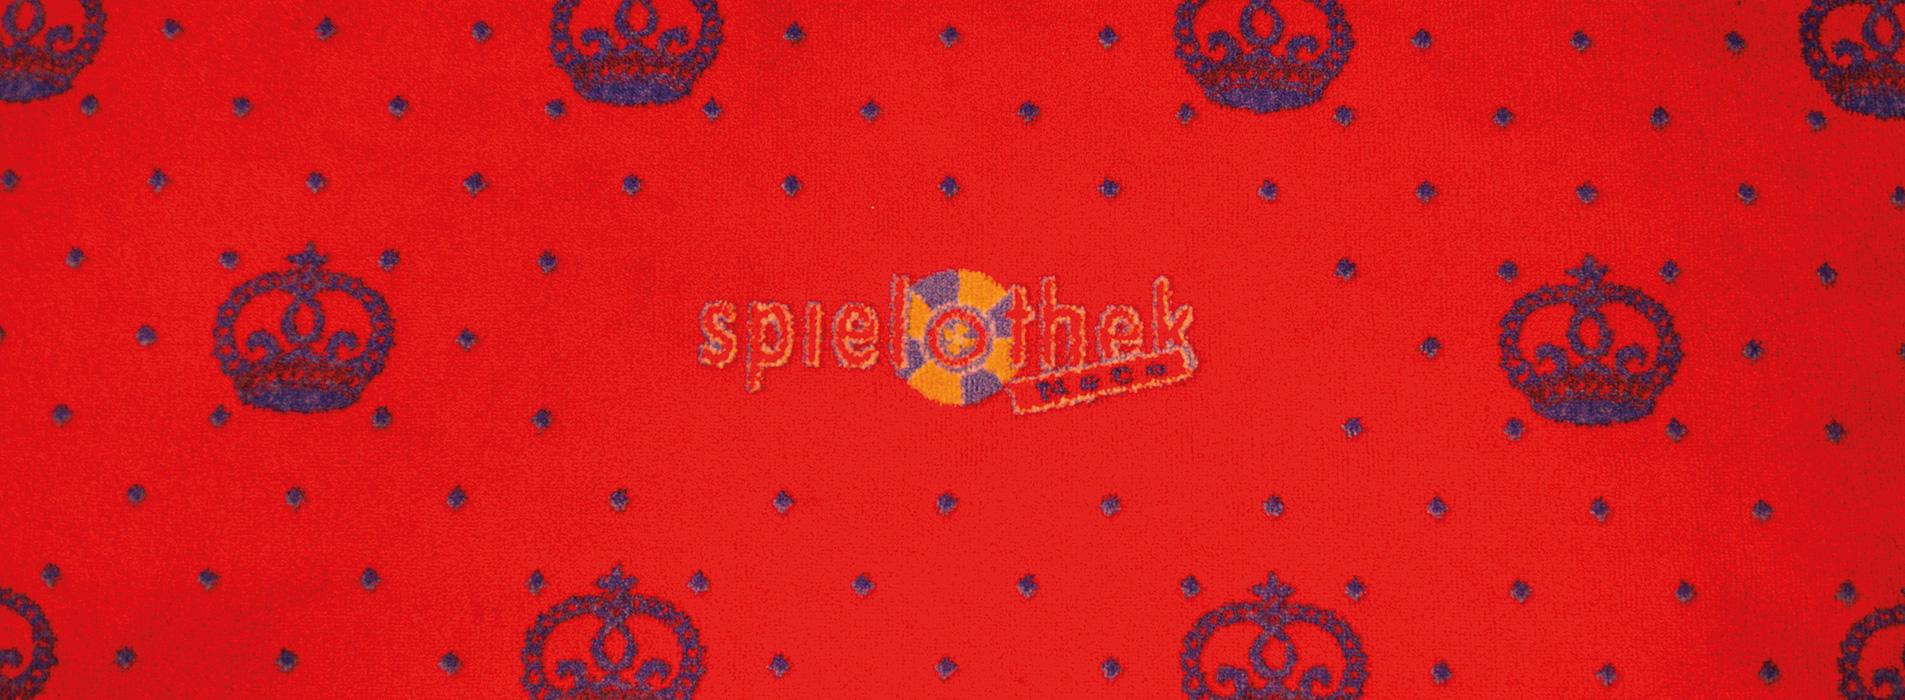 spielothek-noco-04